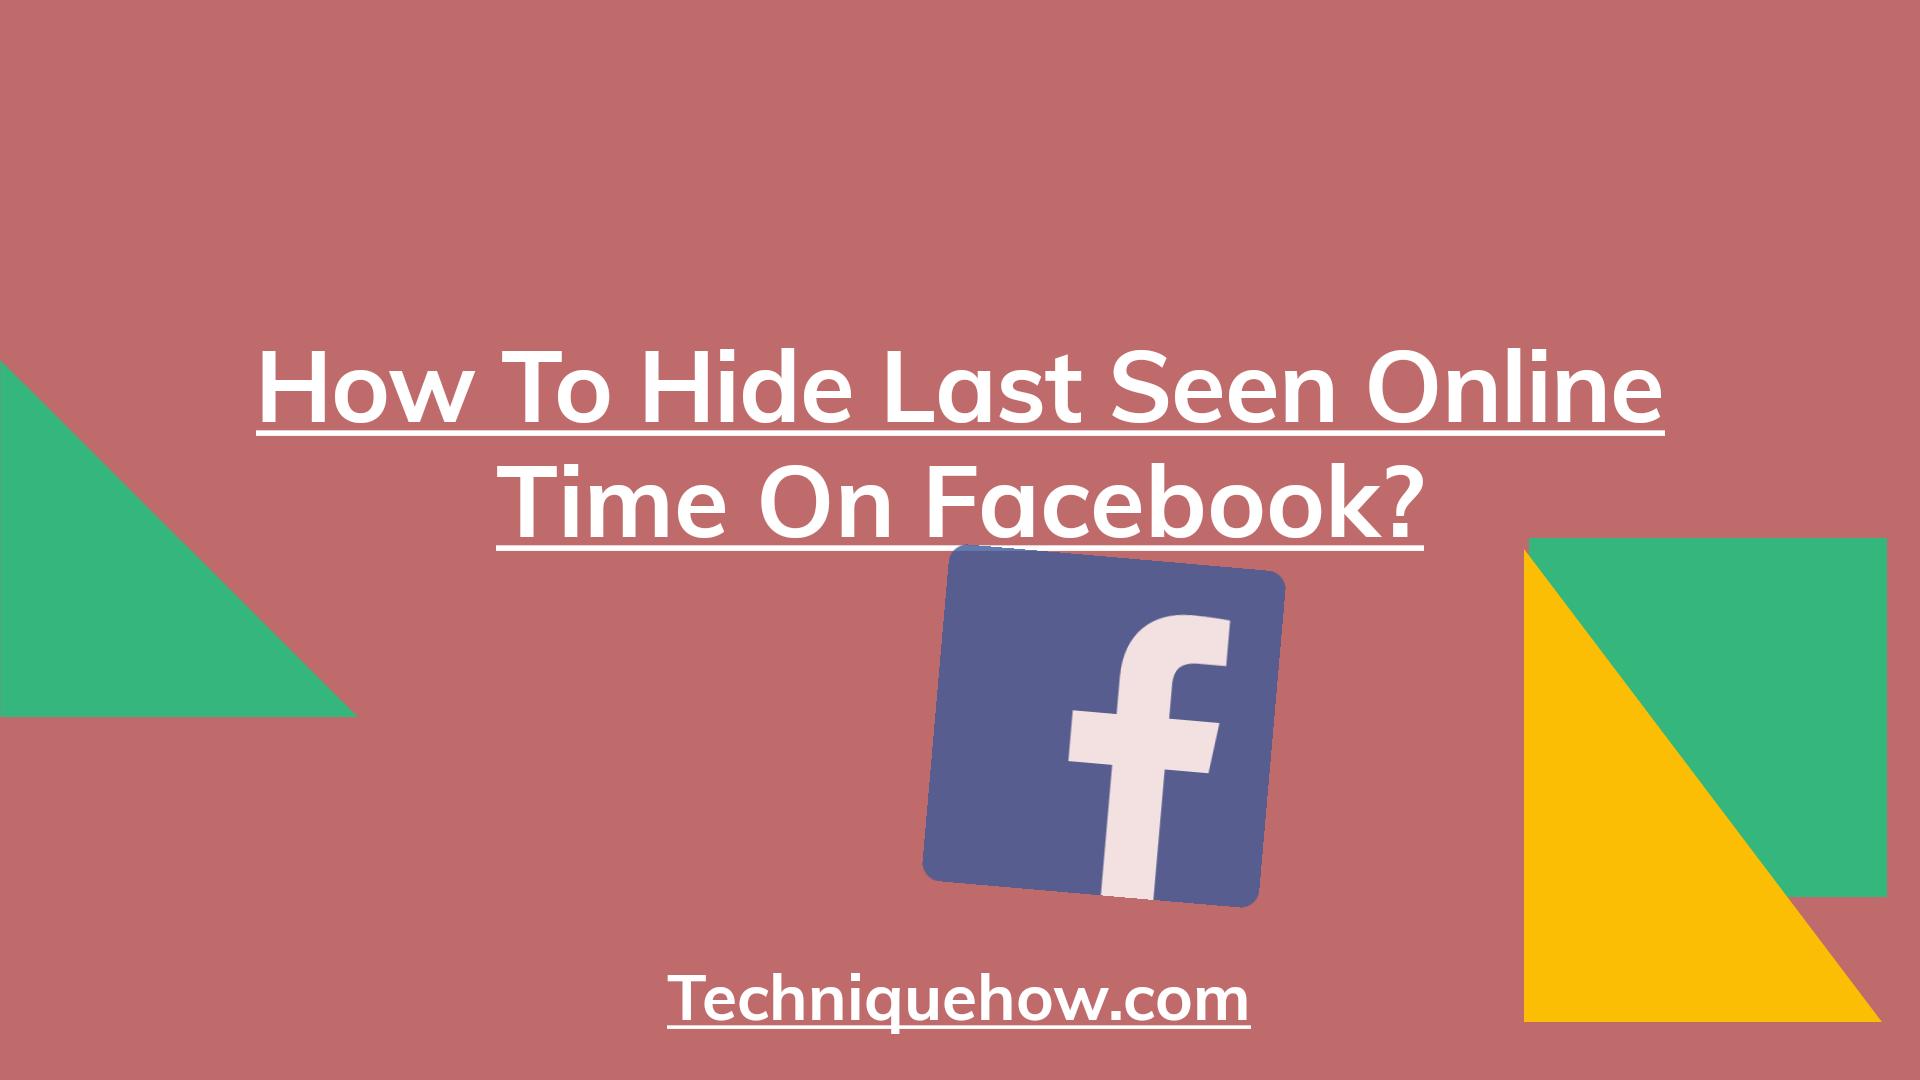 hide last seen online time on Facebook